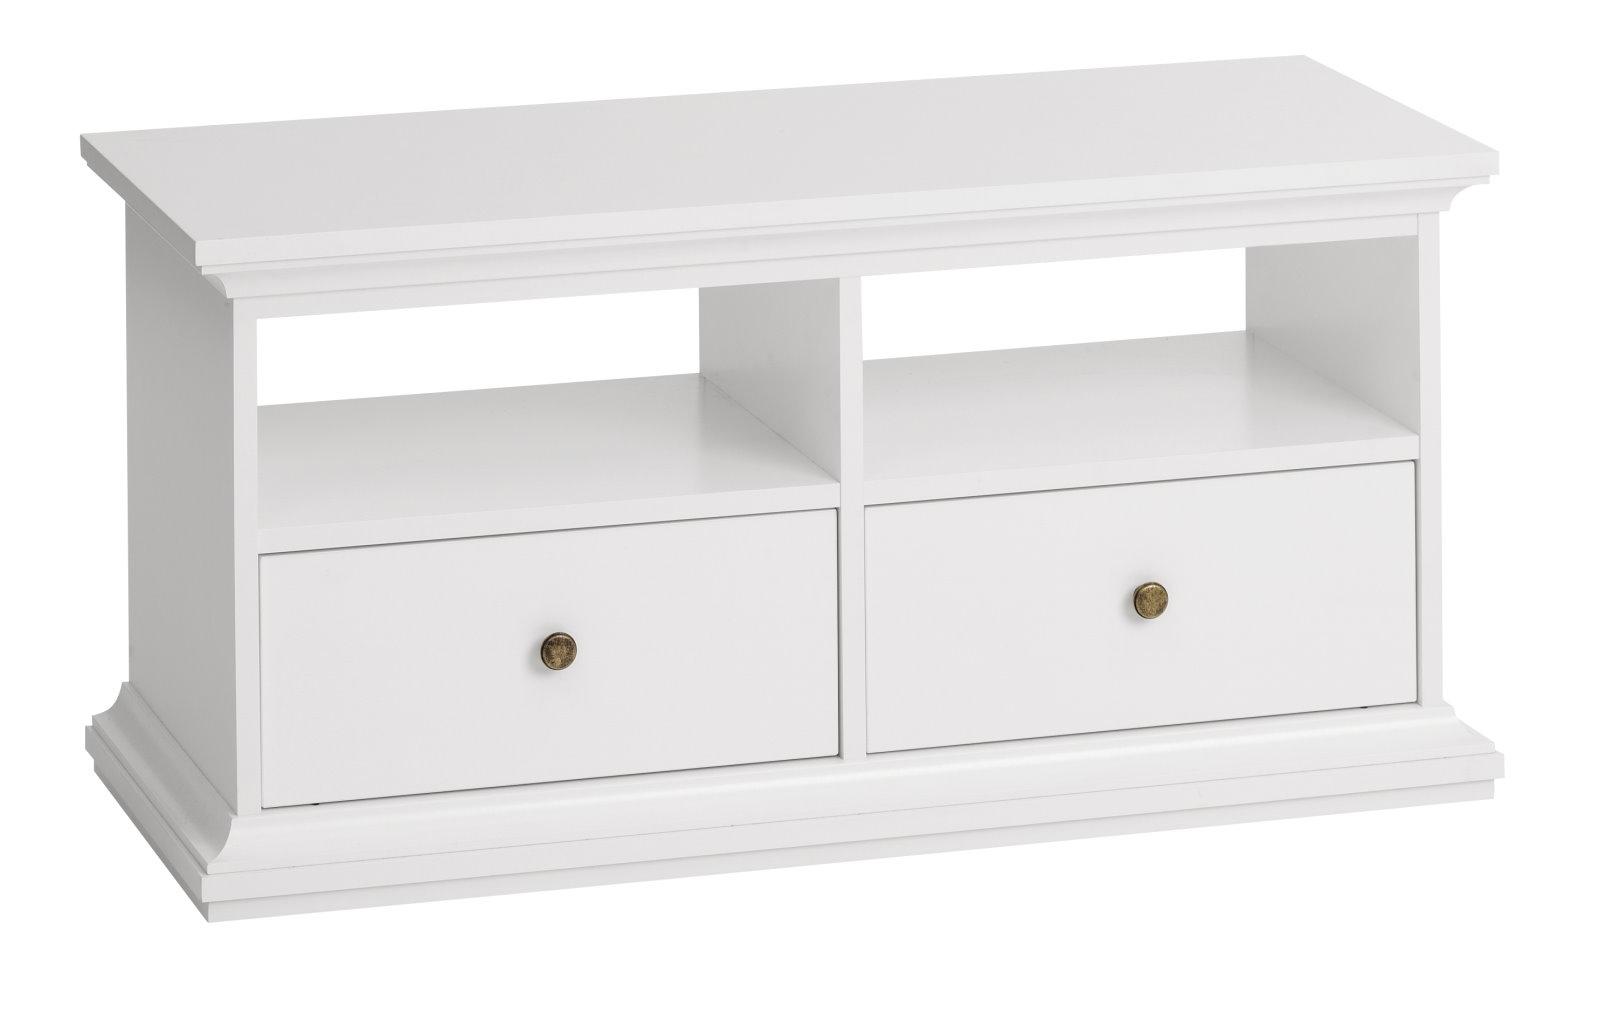 paris tv hifi tisch board lowboard phono schrank kommode. Black Bedroom Furniture Sets. Home Design Ideas